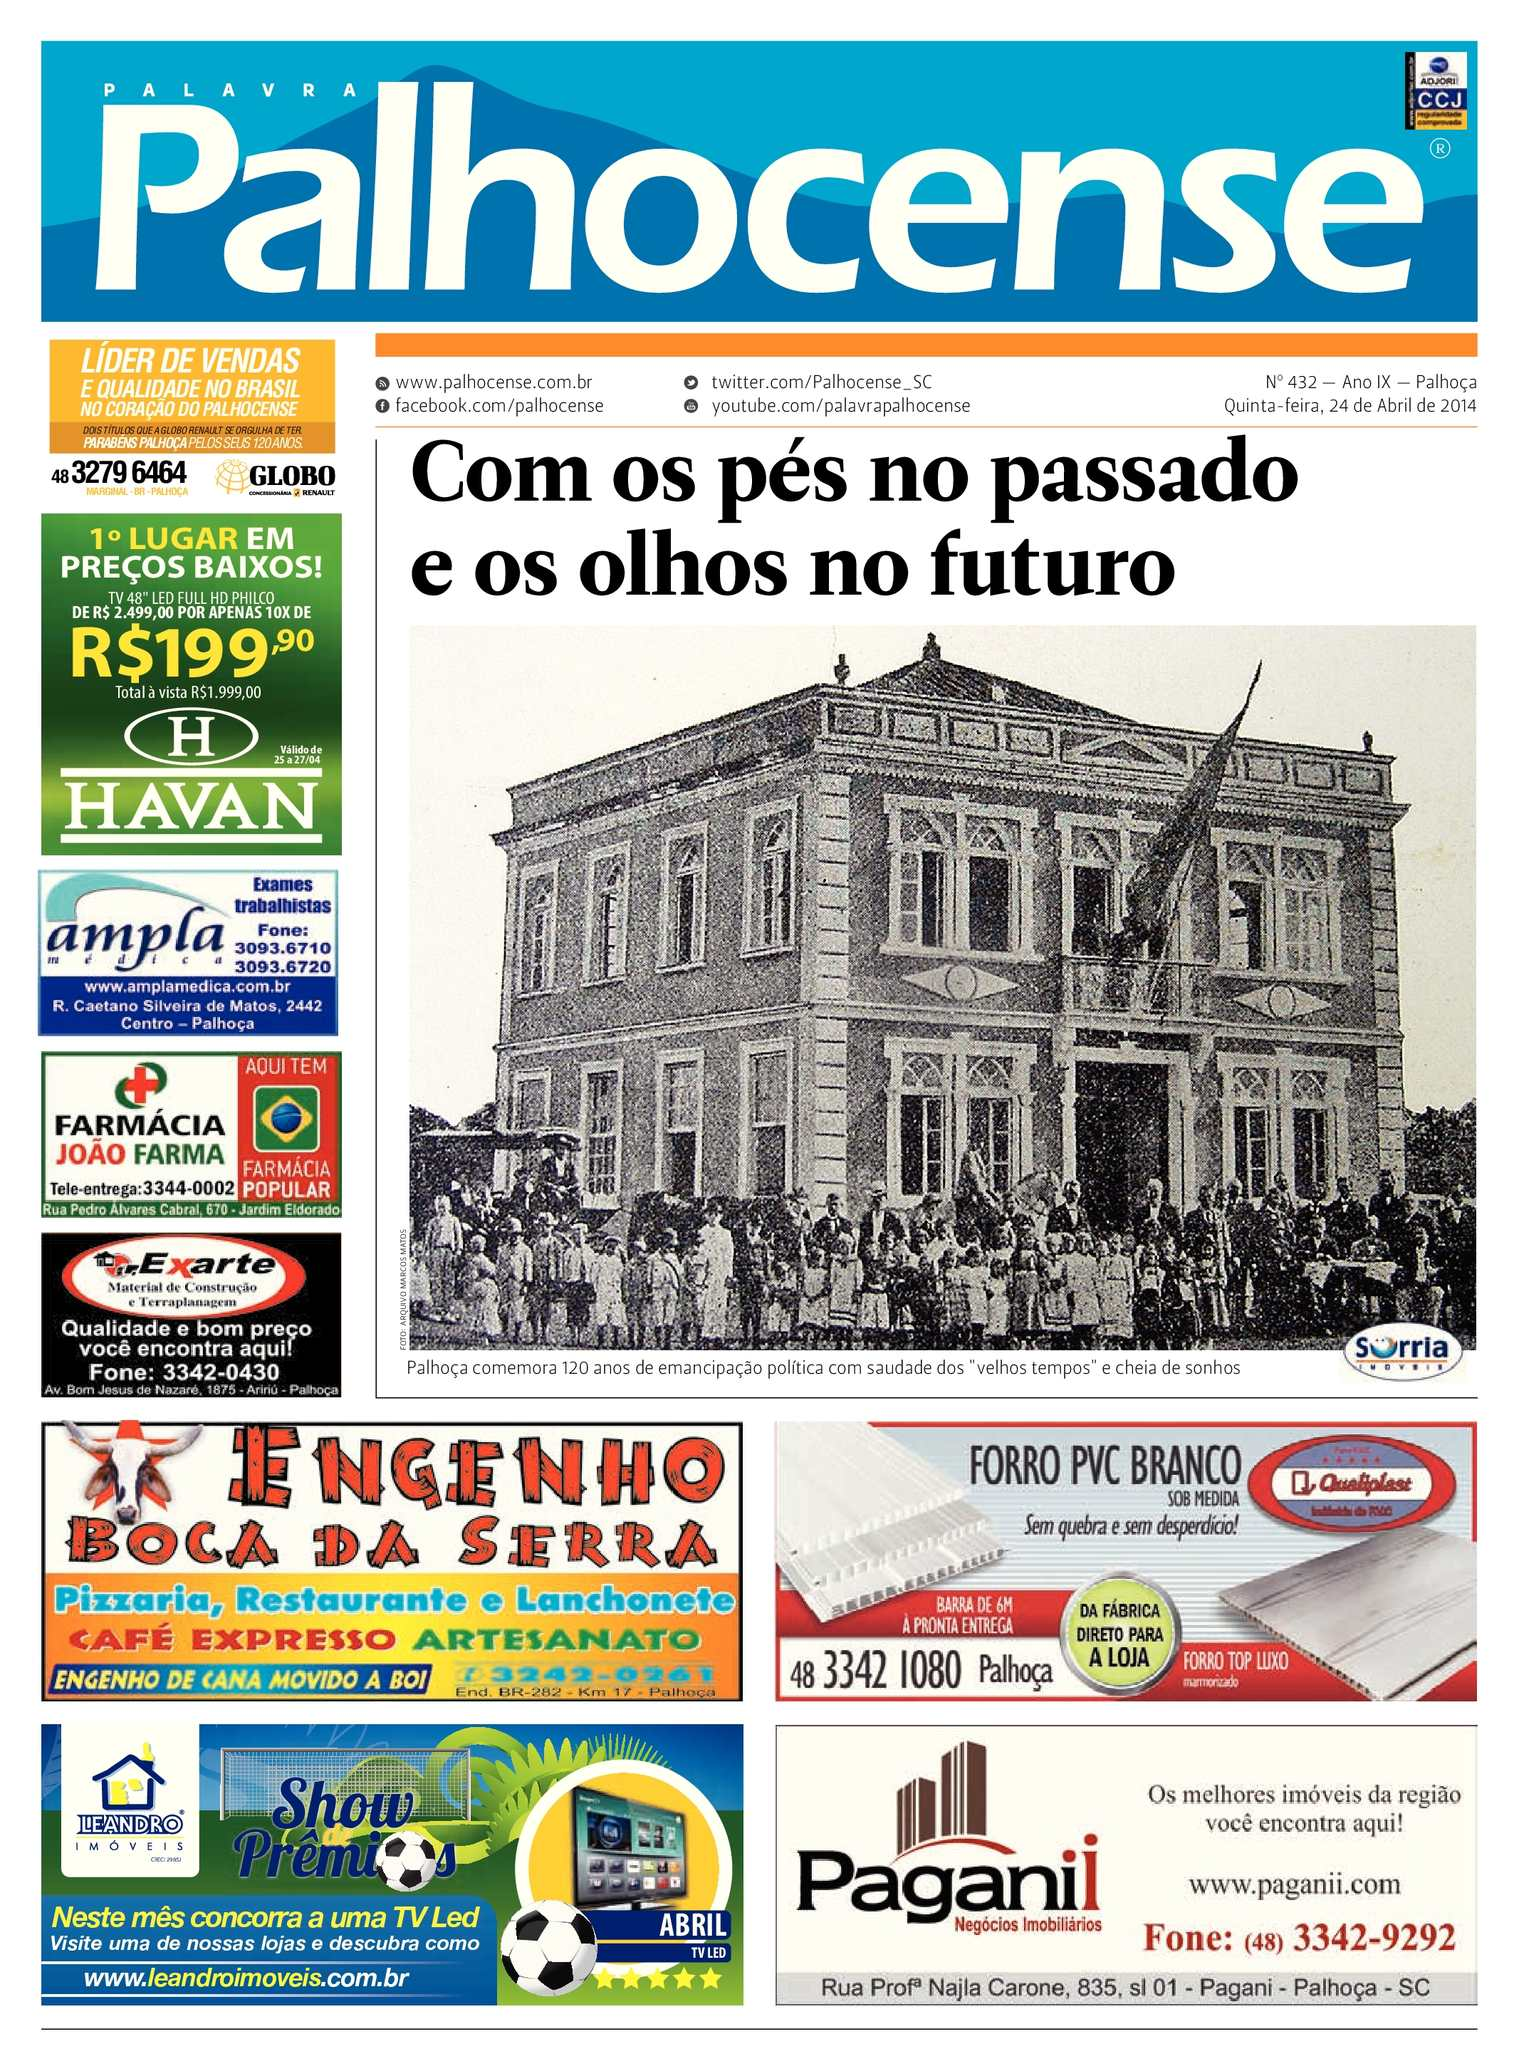 f417f89ea7787 Calaméo - Jornal Palavra Palhocense - Edição 432